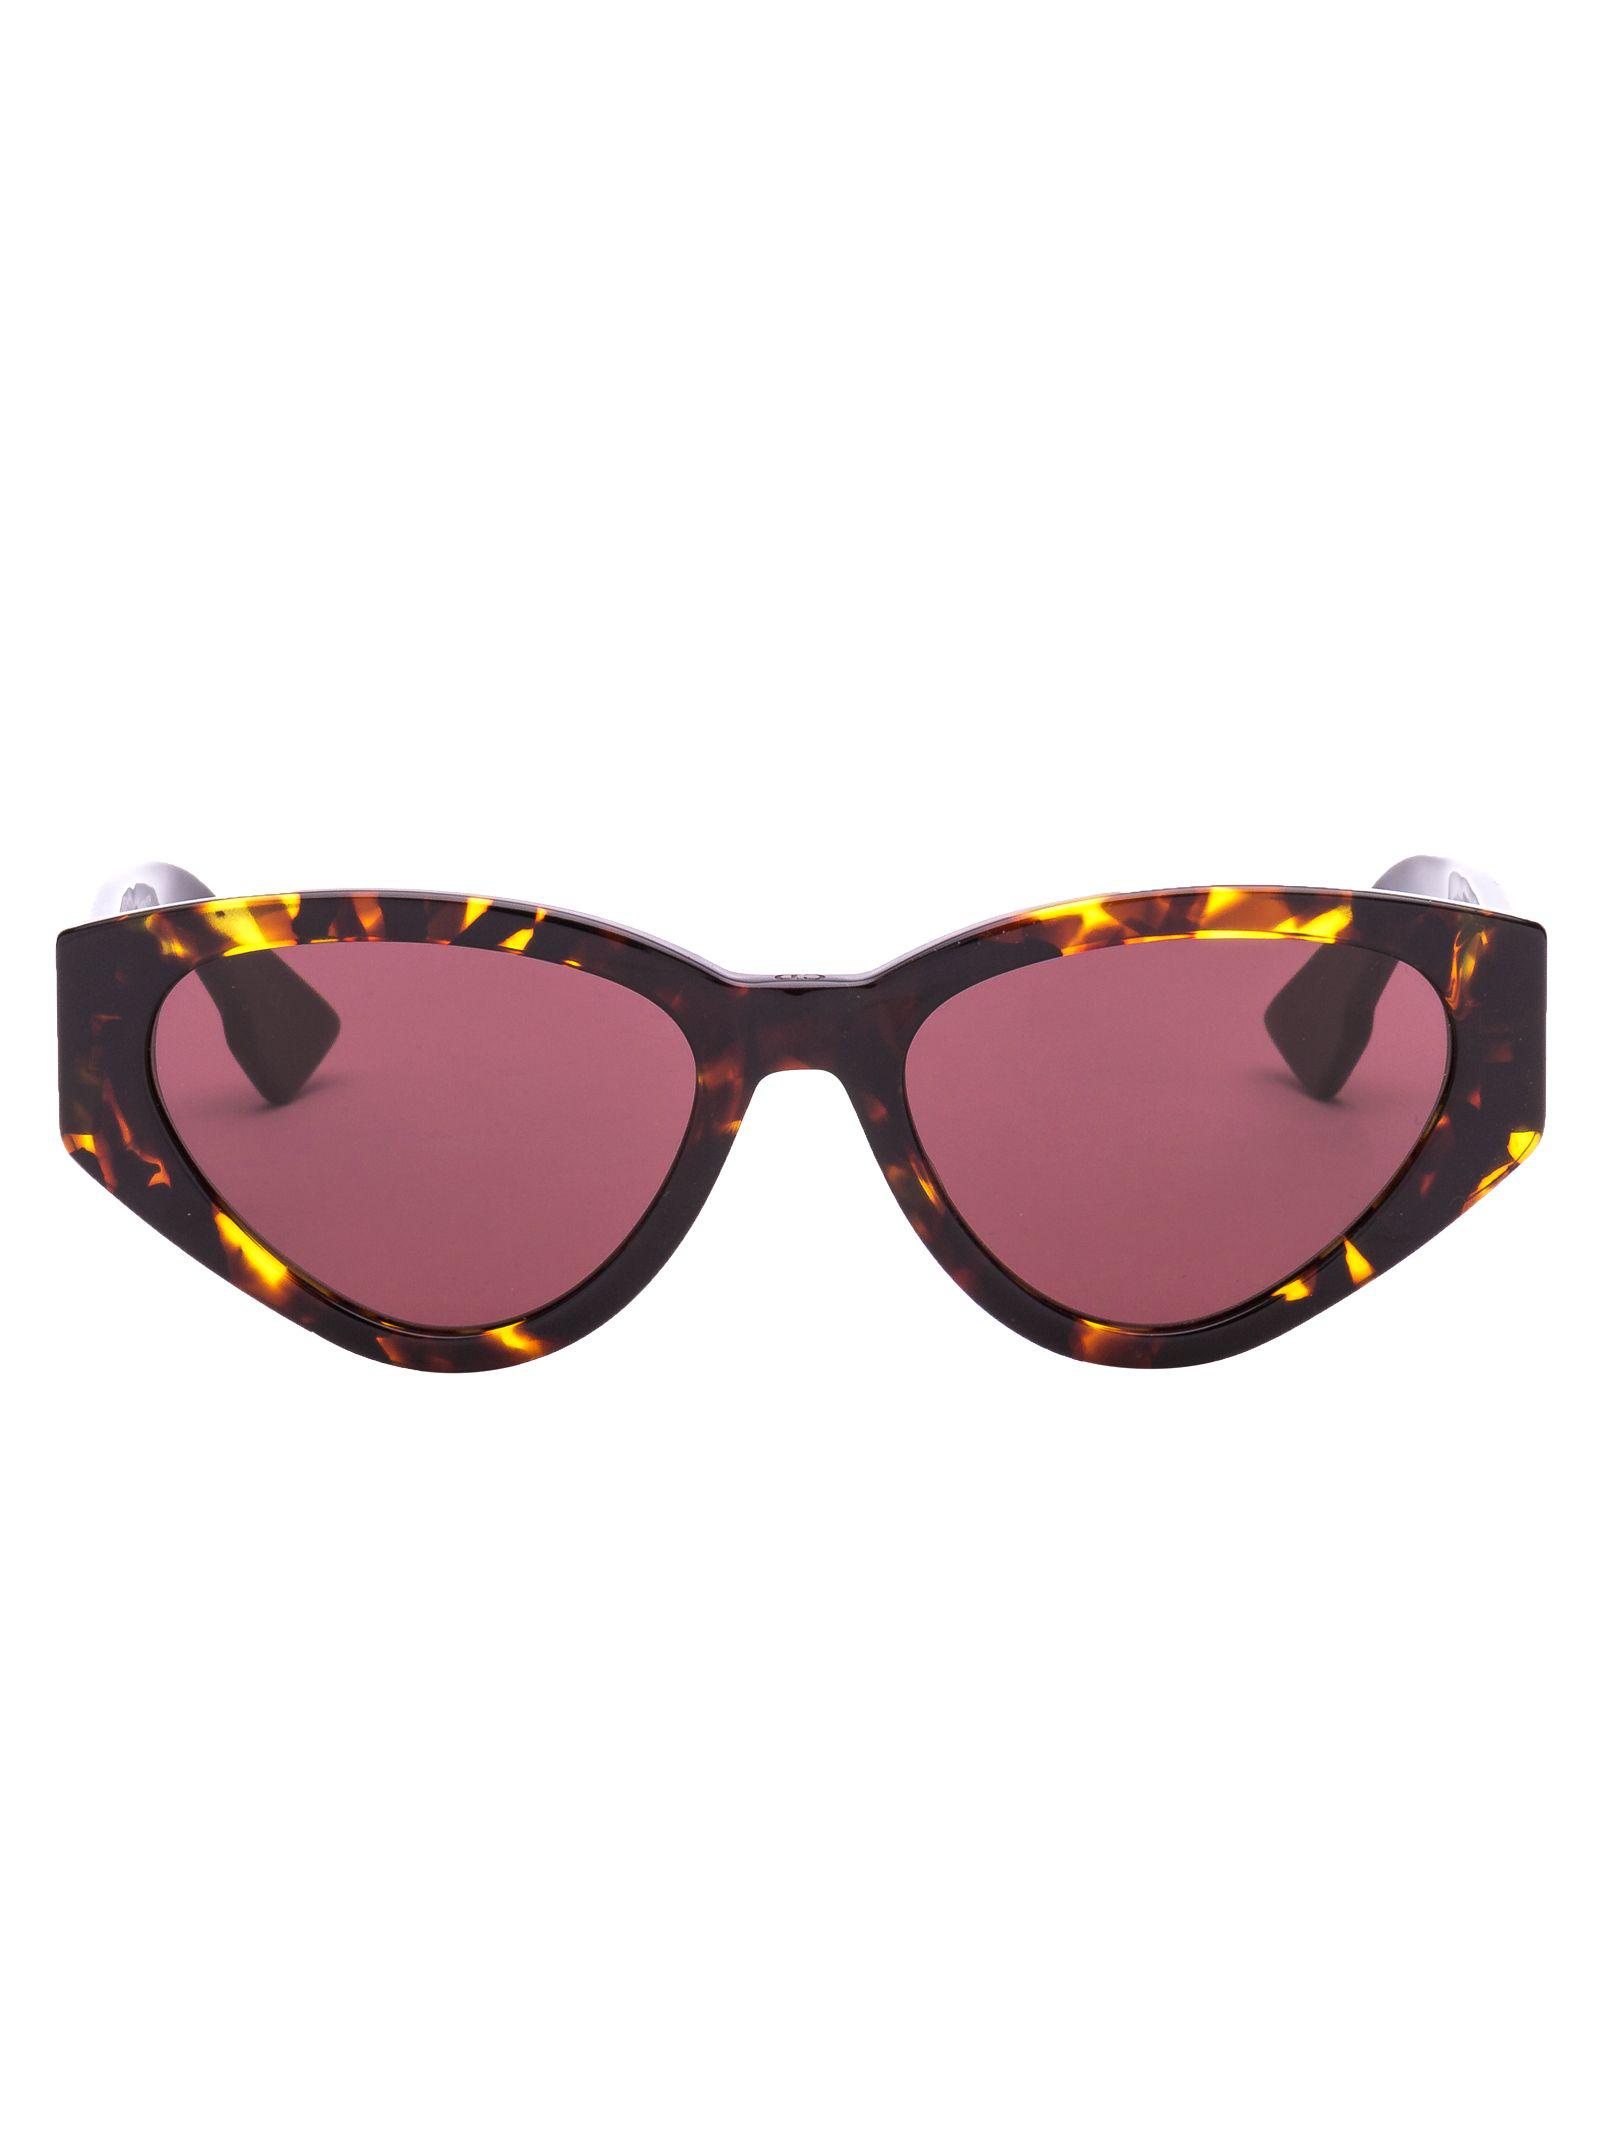 fbbeb8db02 Dior Eyewear Spirit 2 Sunglasses In Epzu1